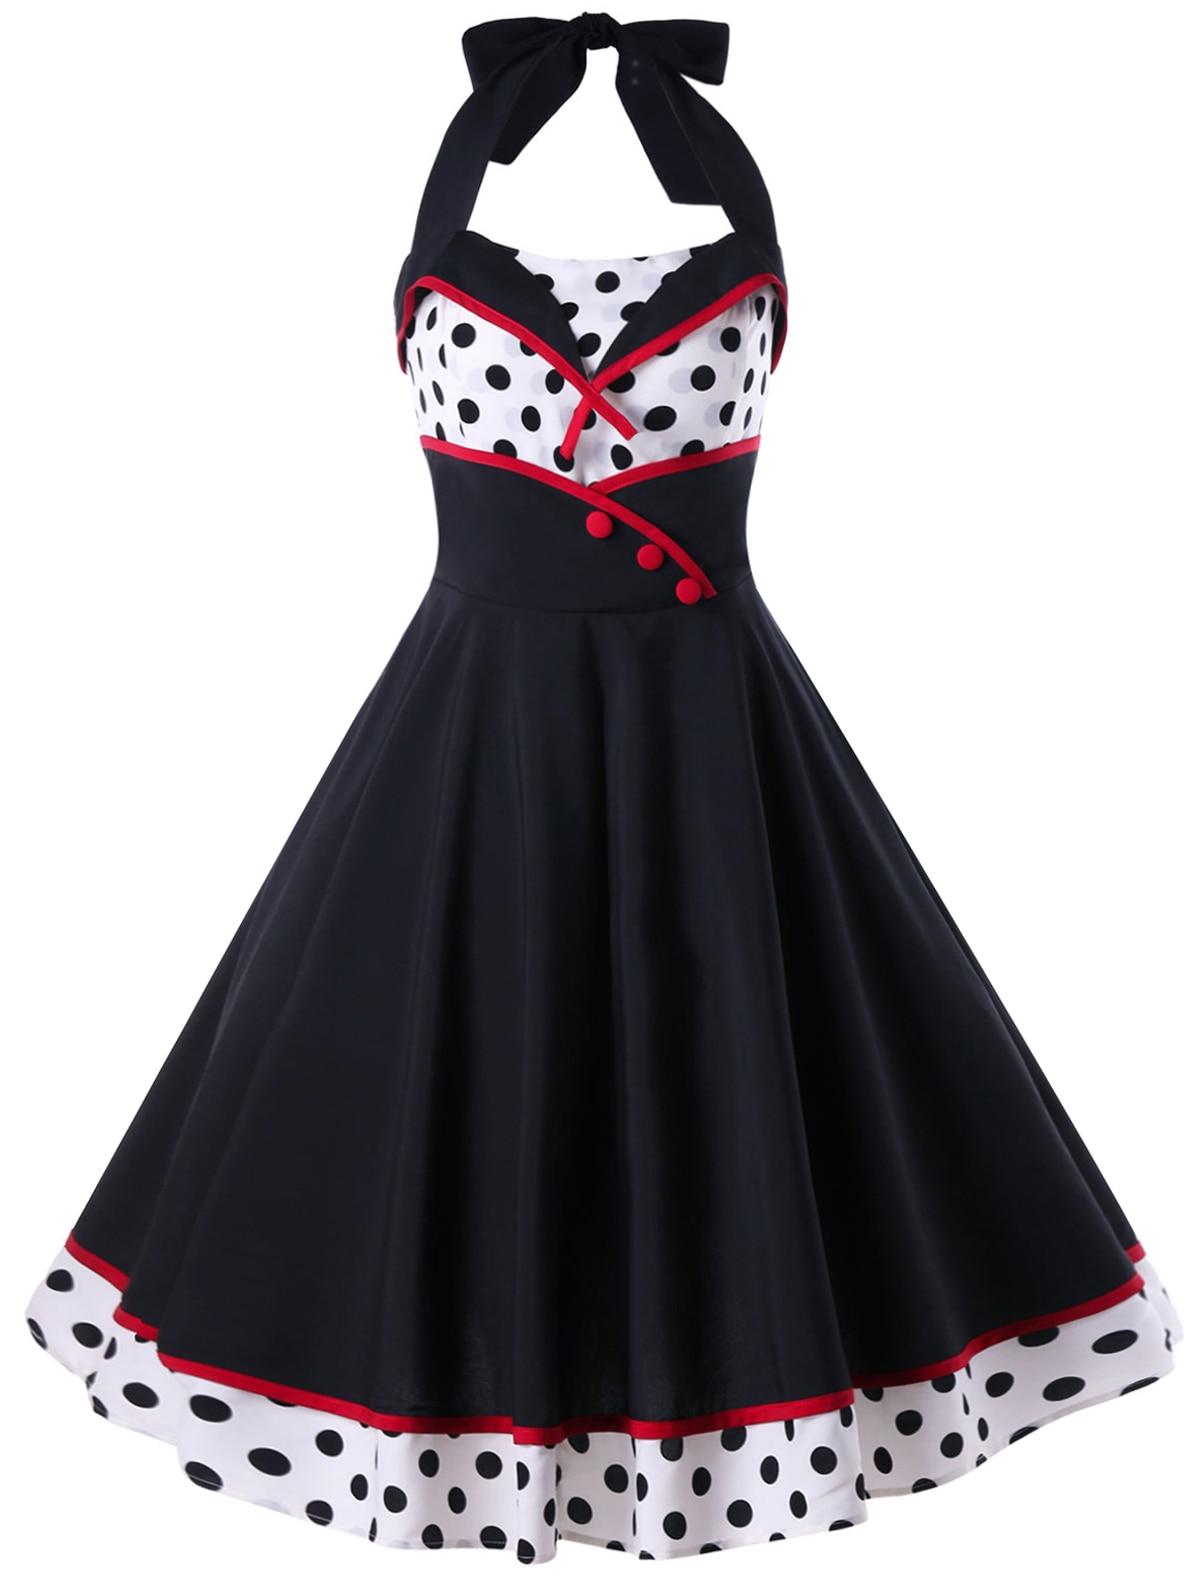 Aliexpress Buy Zaful Polka Dot Print Pin Up Dress